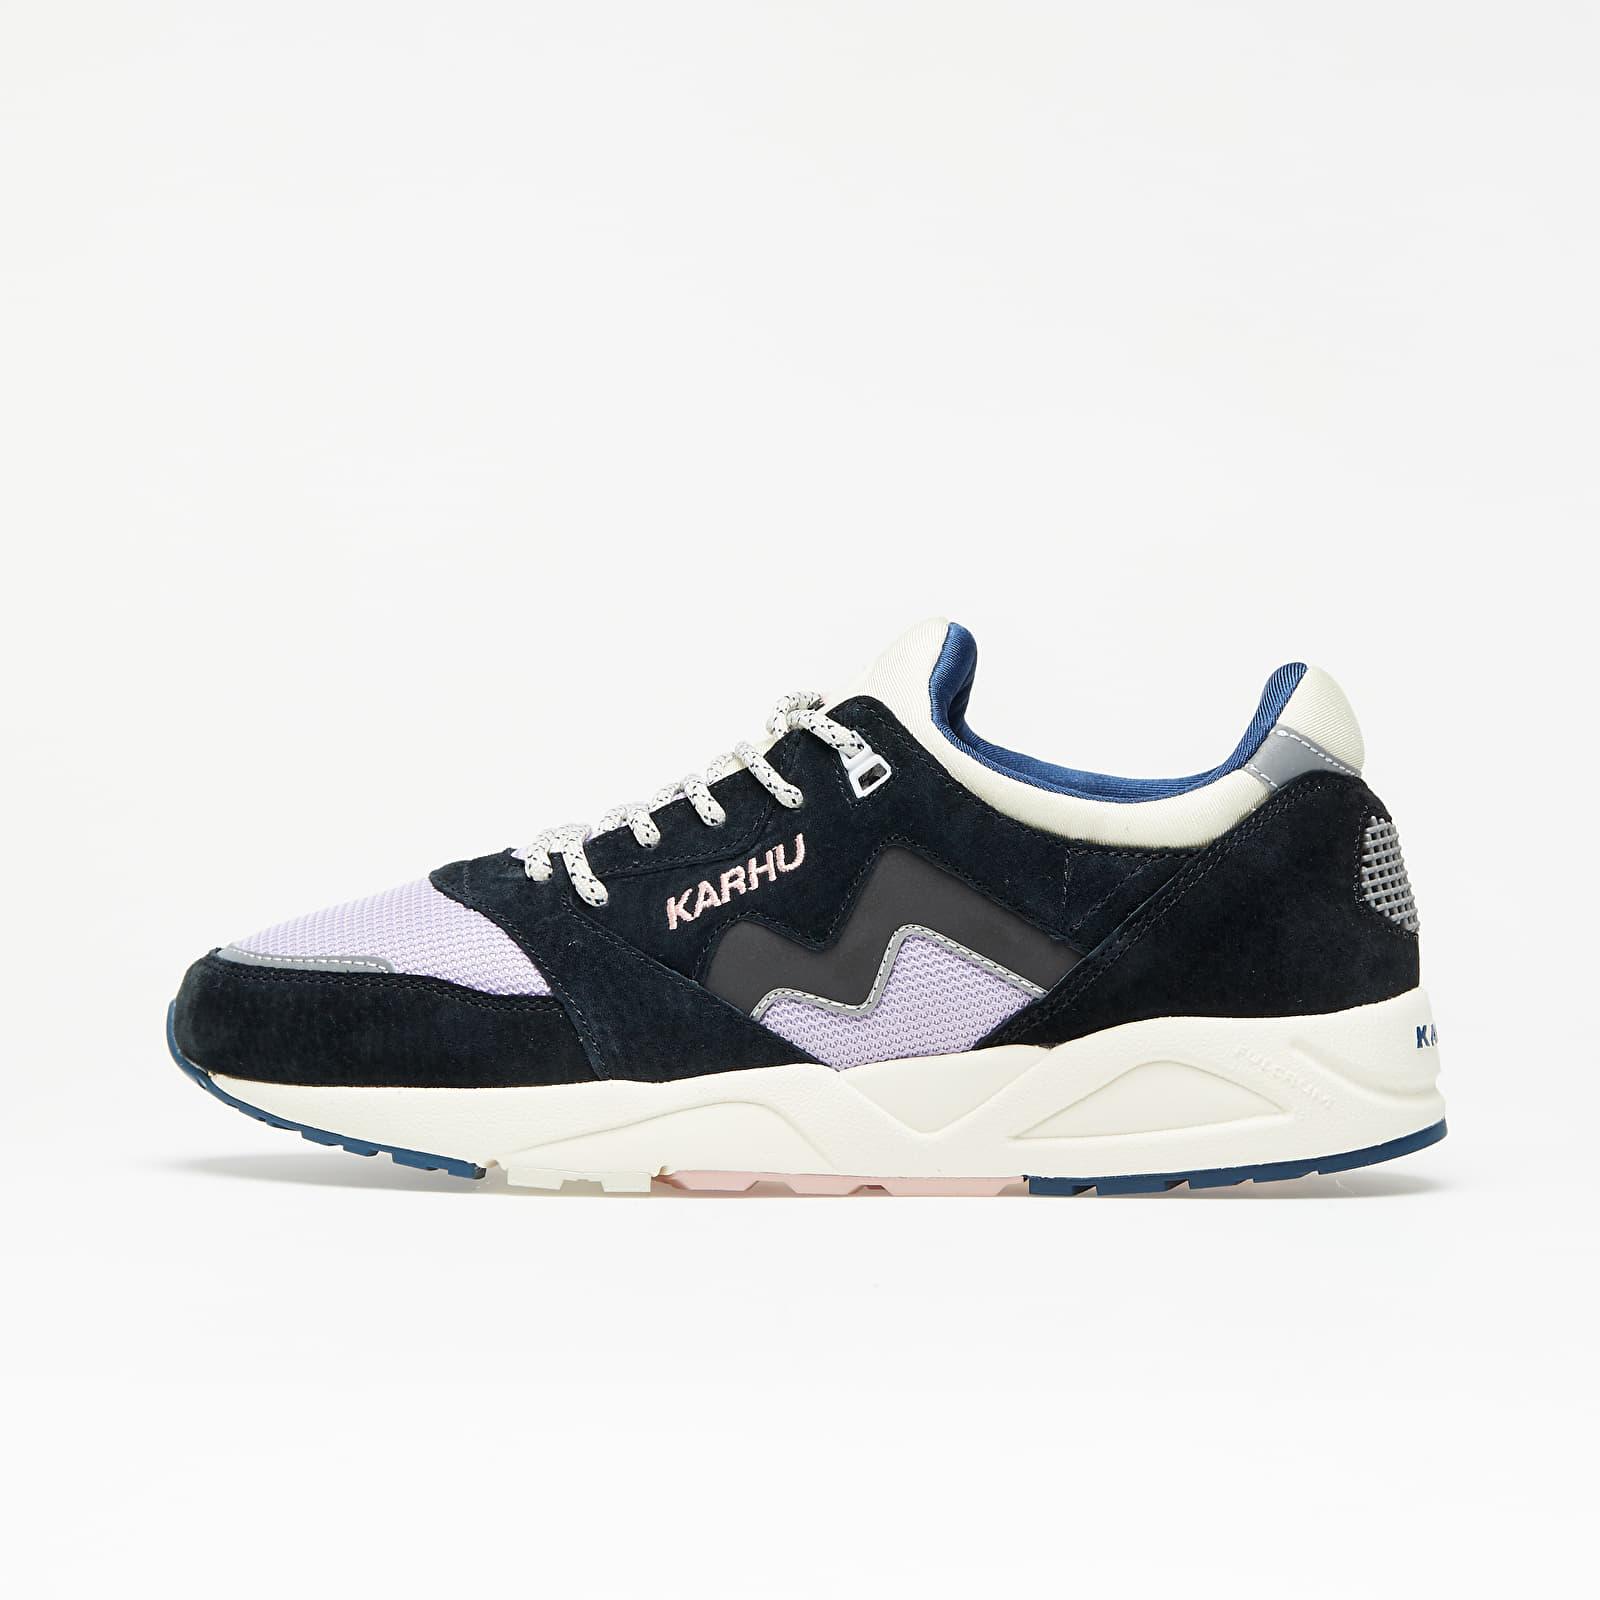 Men's shoes Karhu Aria 95 Jet Black